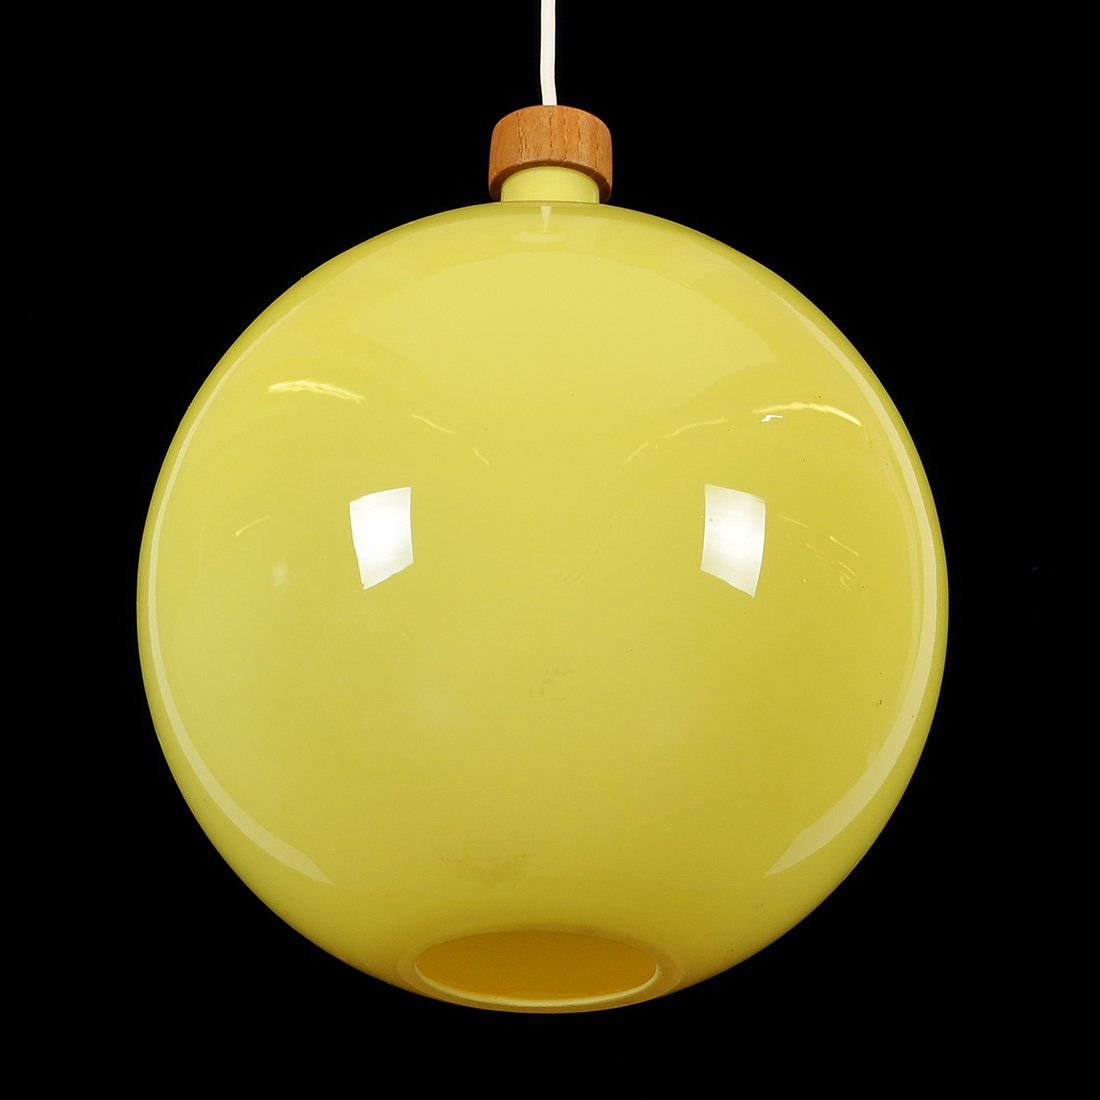 14: TAKLAMPA, glas/teak, retro 1960/70-tal, Holmegaard